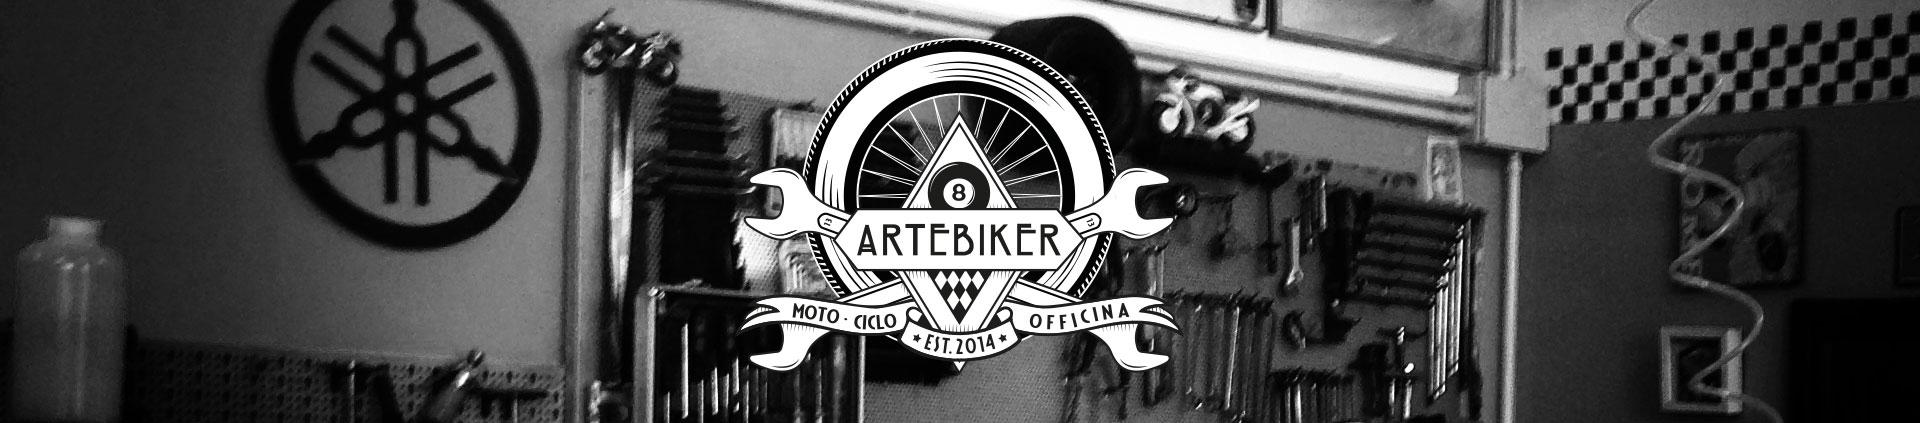 ARTEBIKER_LOGO_04